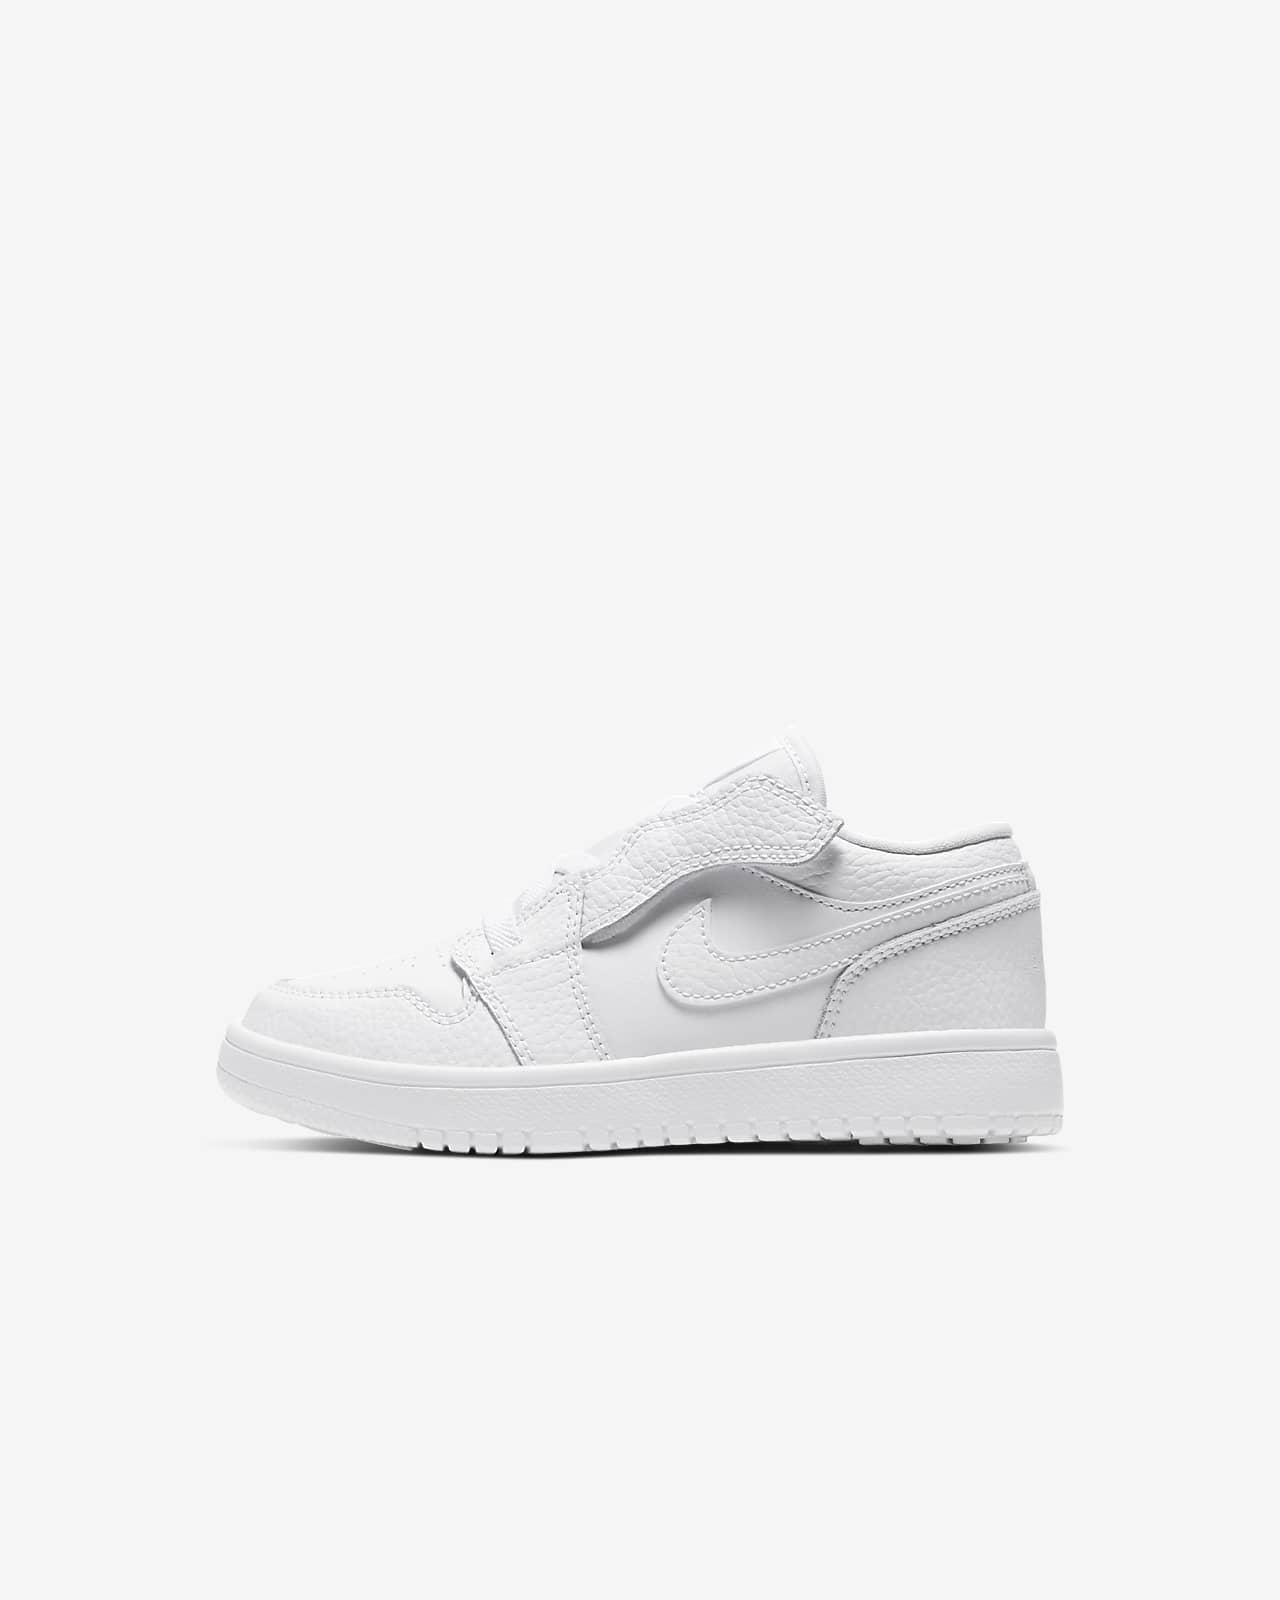 Jordan 1 Low Alt 小童鞋款